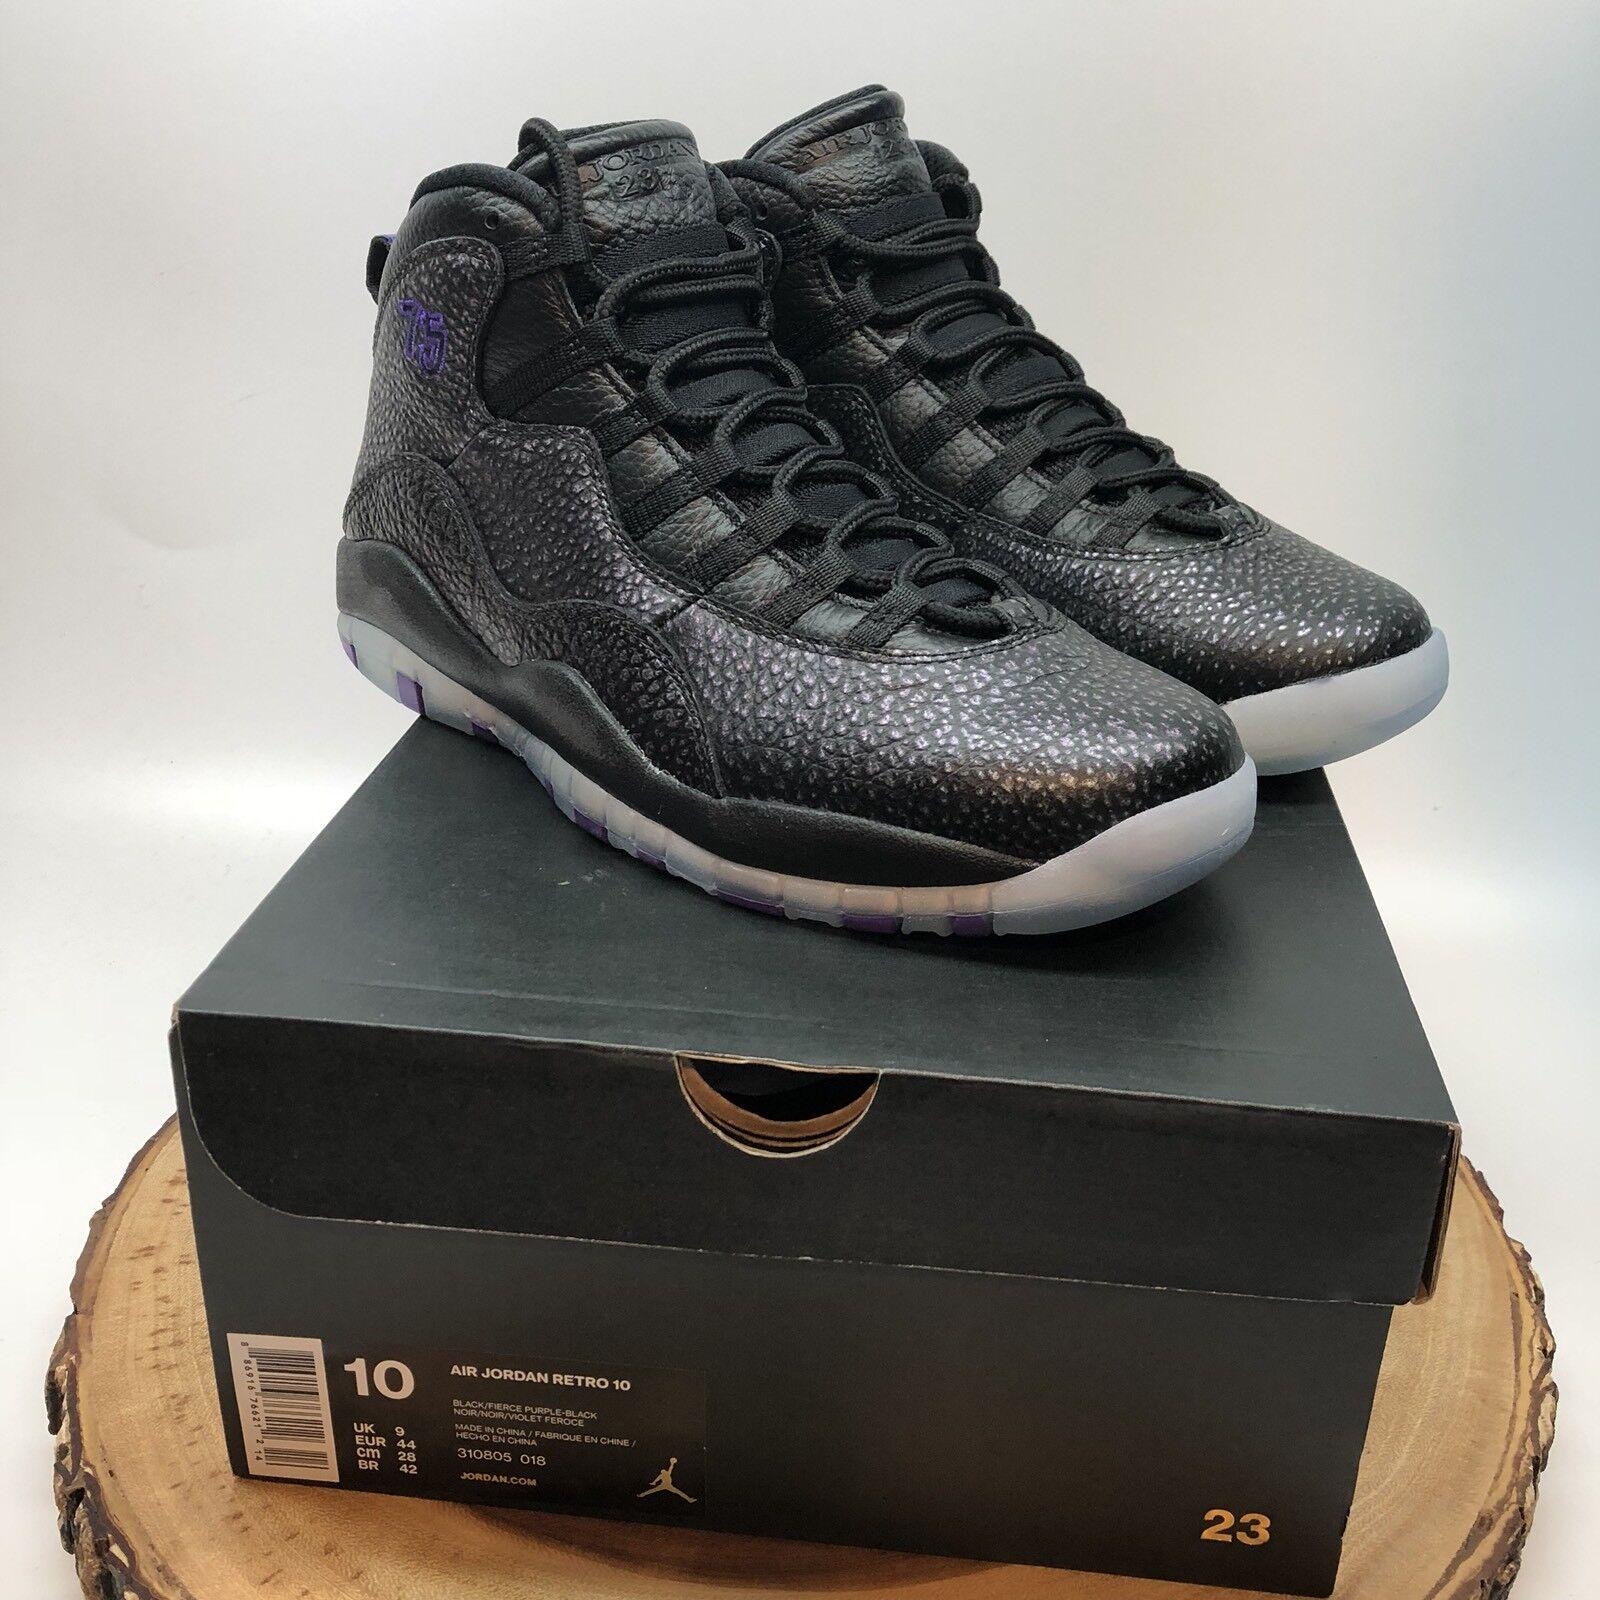 Nike Nike Nike air jordan retro - x stadt paris pack euro exklusive 310805 018 größe 10 xi - xii 1946f0